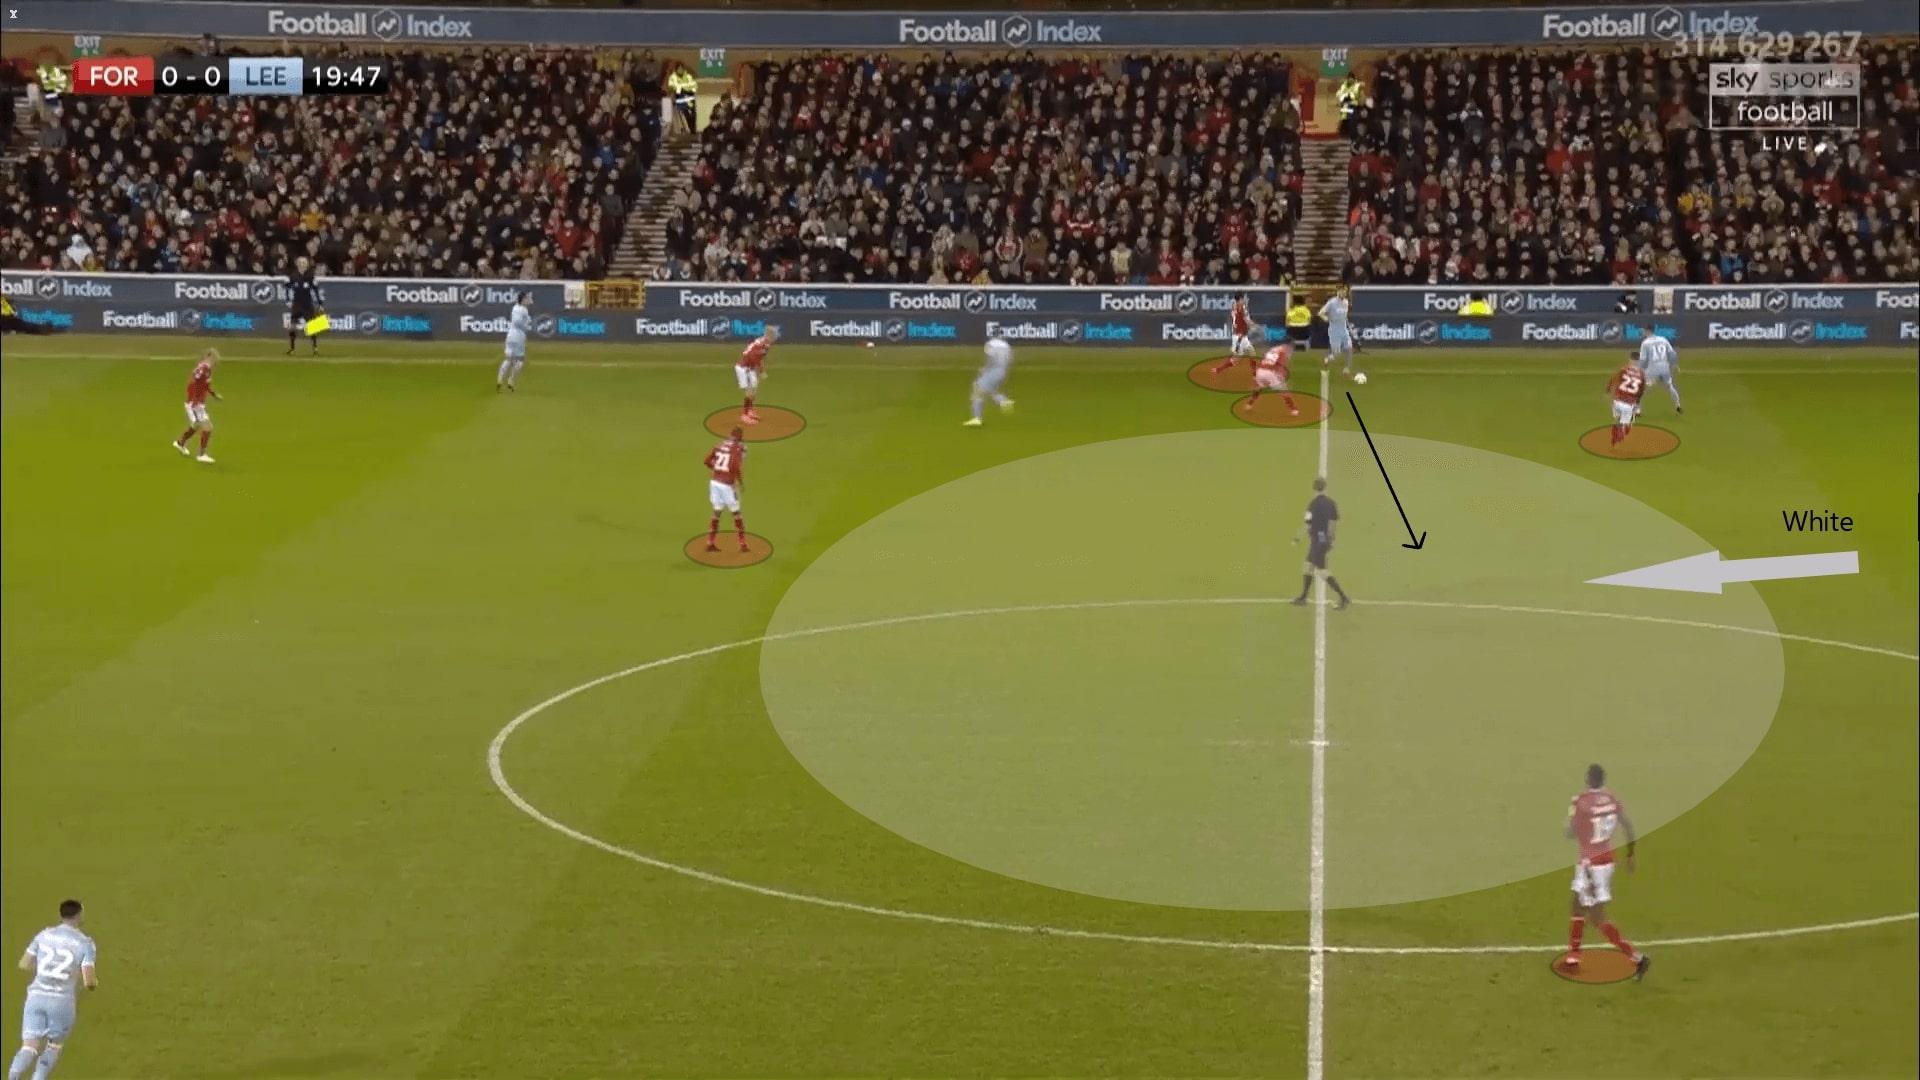 EFL Championship 2019/20: Nottingham Forest vs Leeds United - tactical analysis tactics